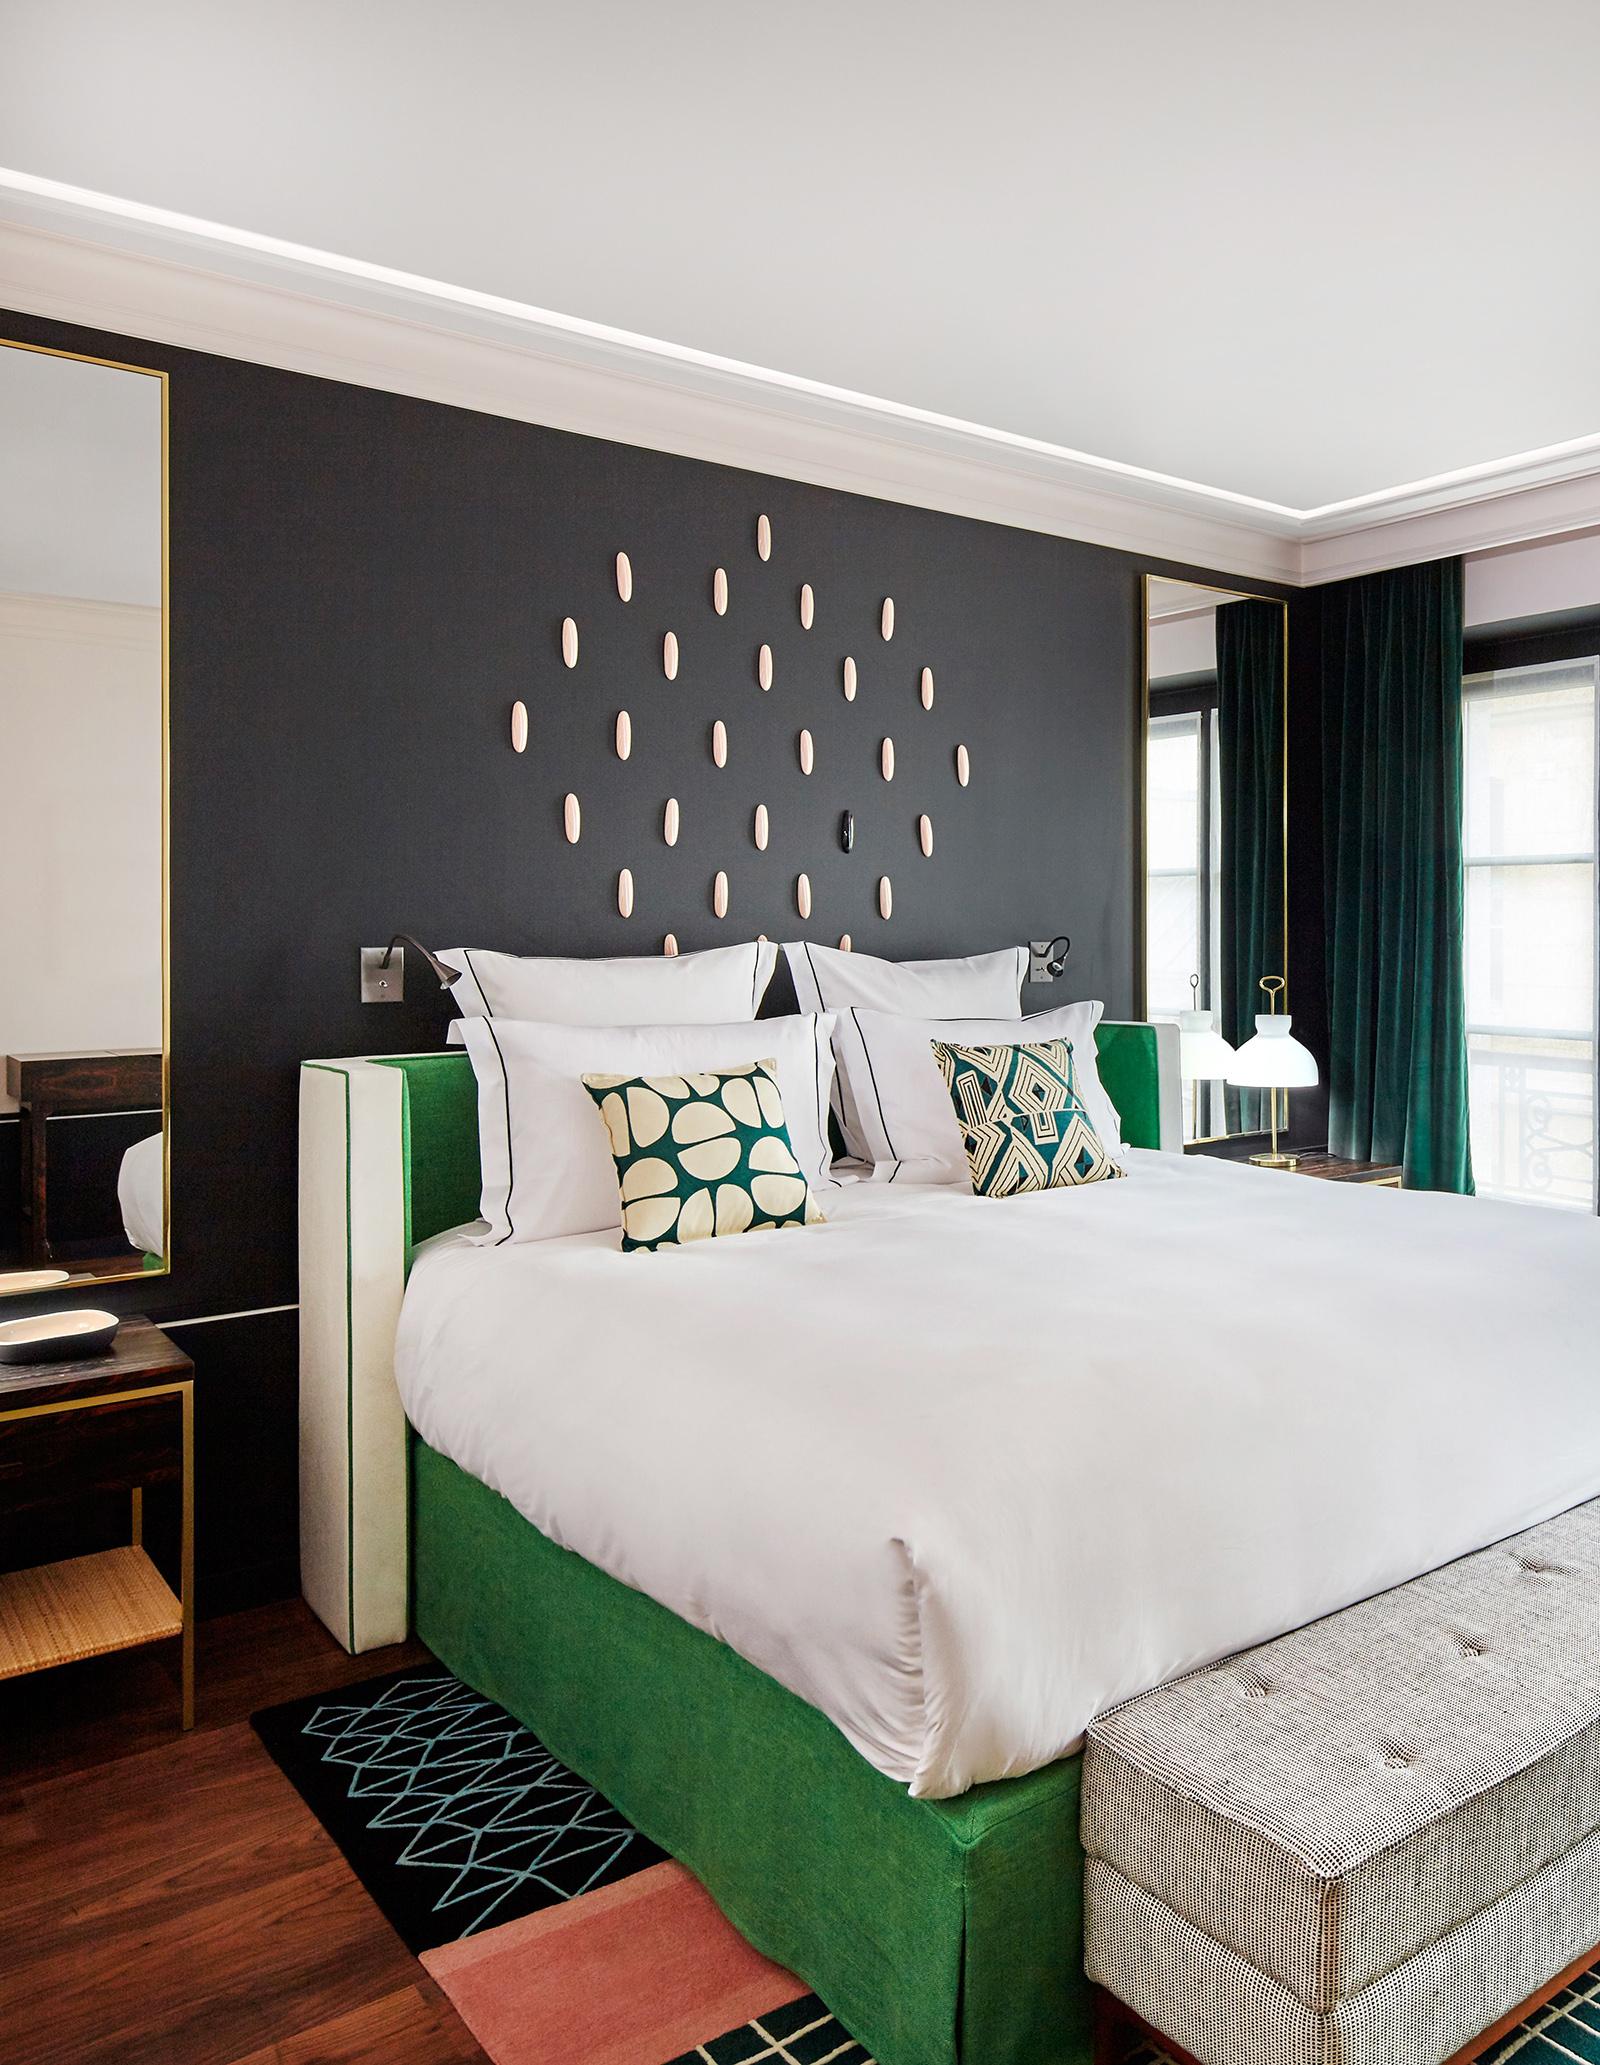 blog_le-roch-hotel-and-spa-prestige-room-v2-R-r.jpg